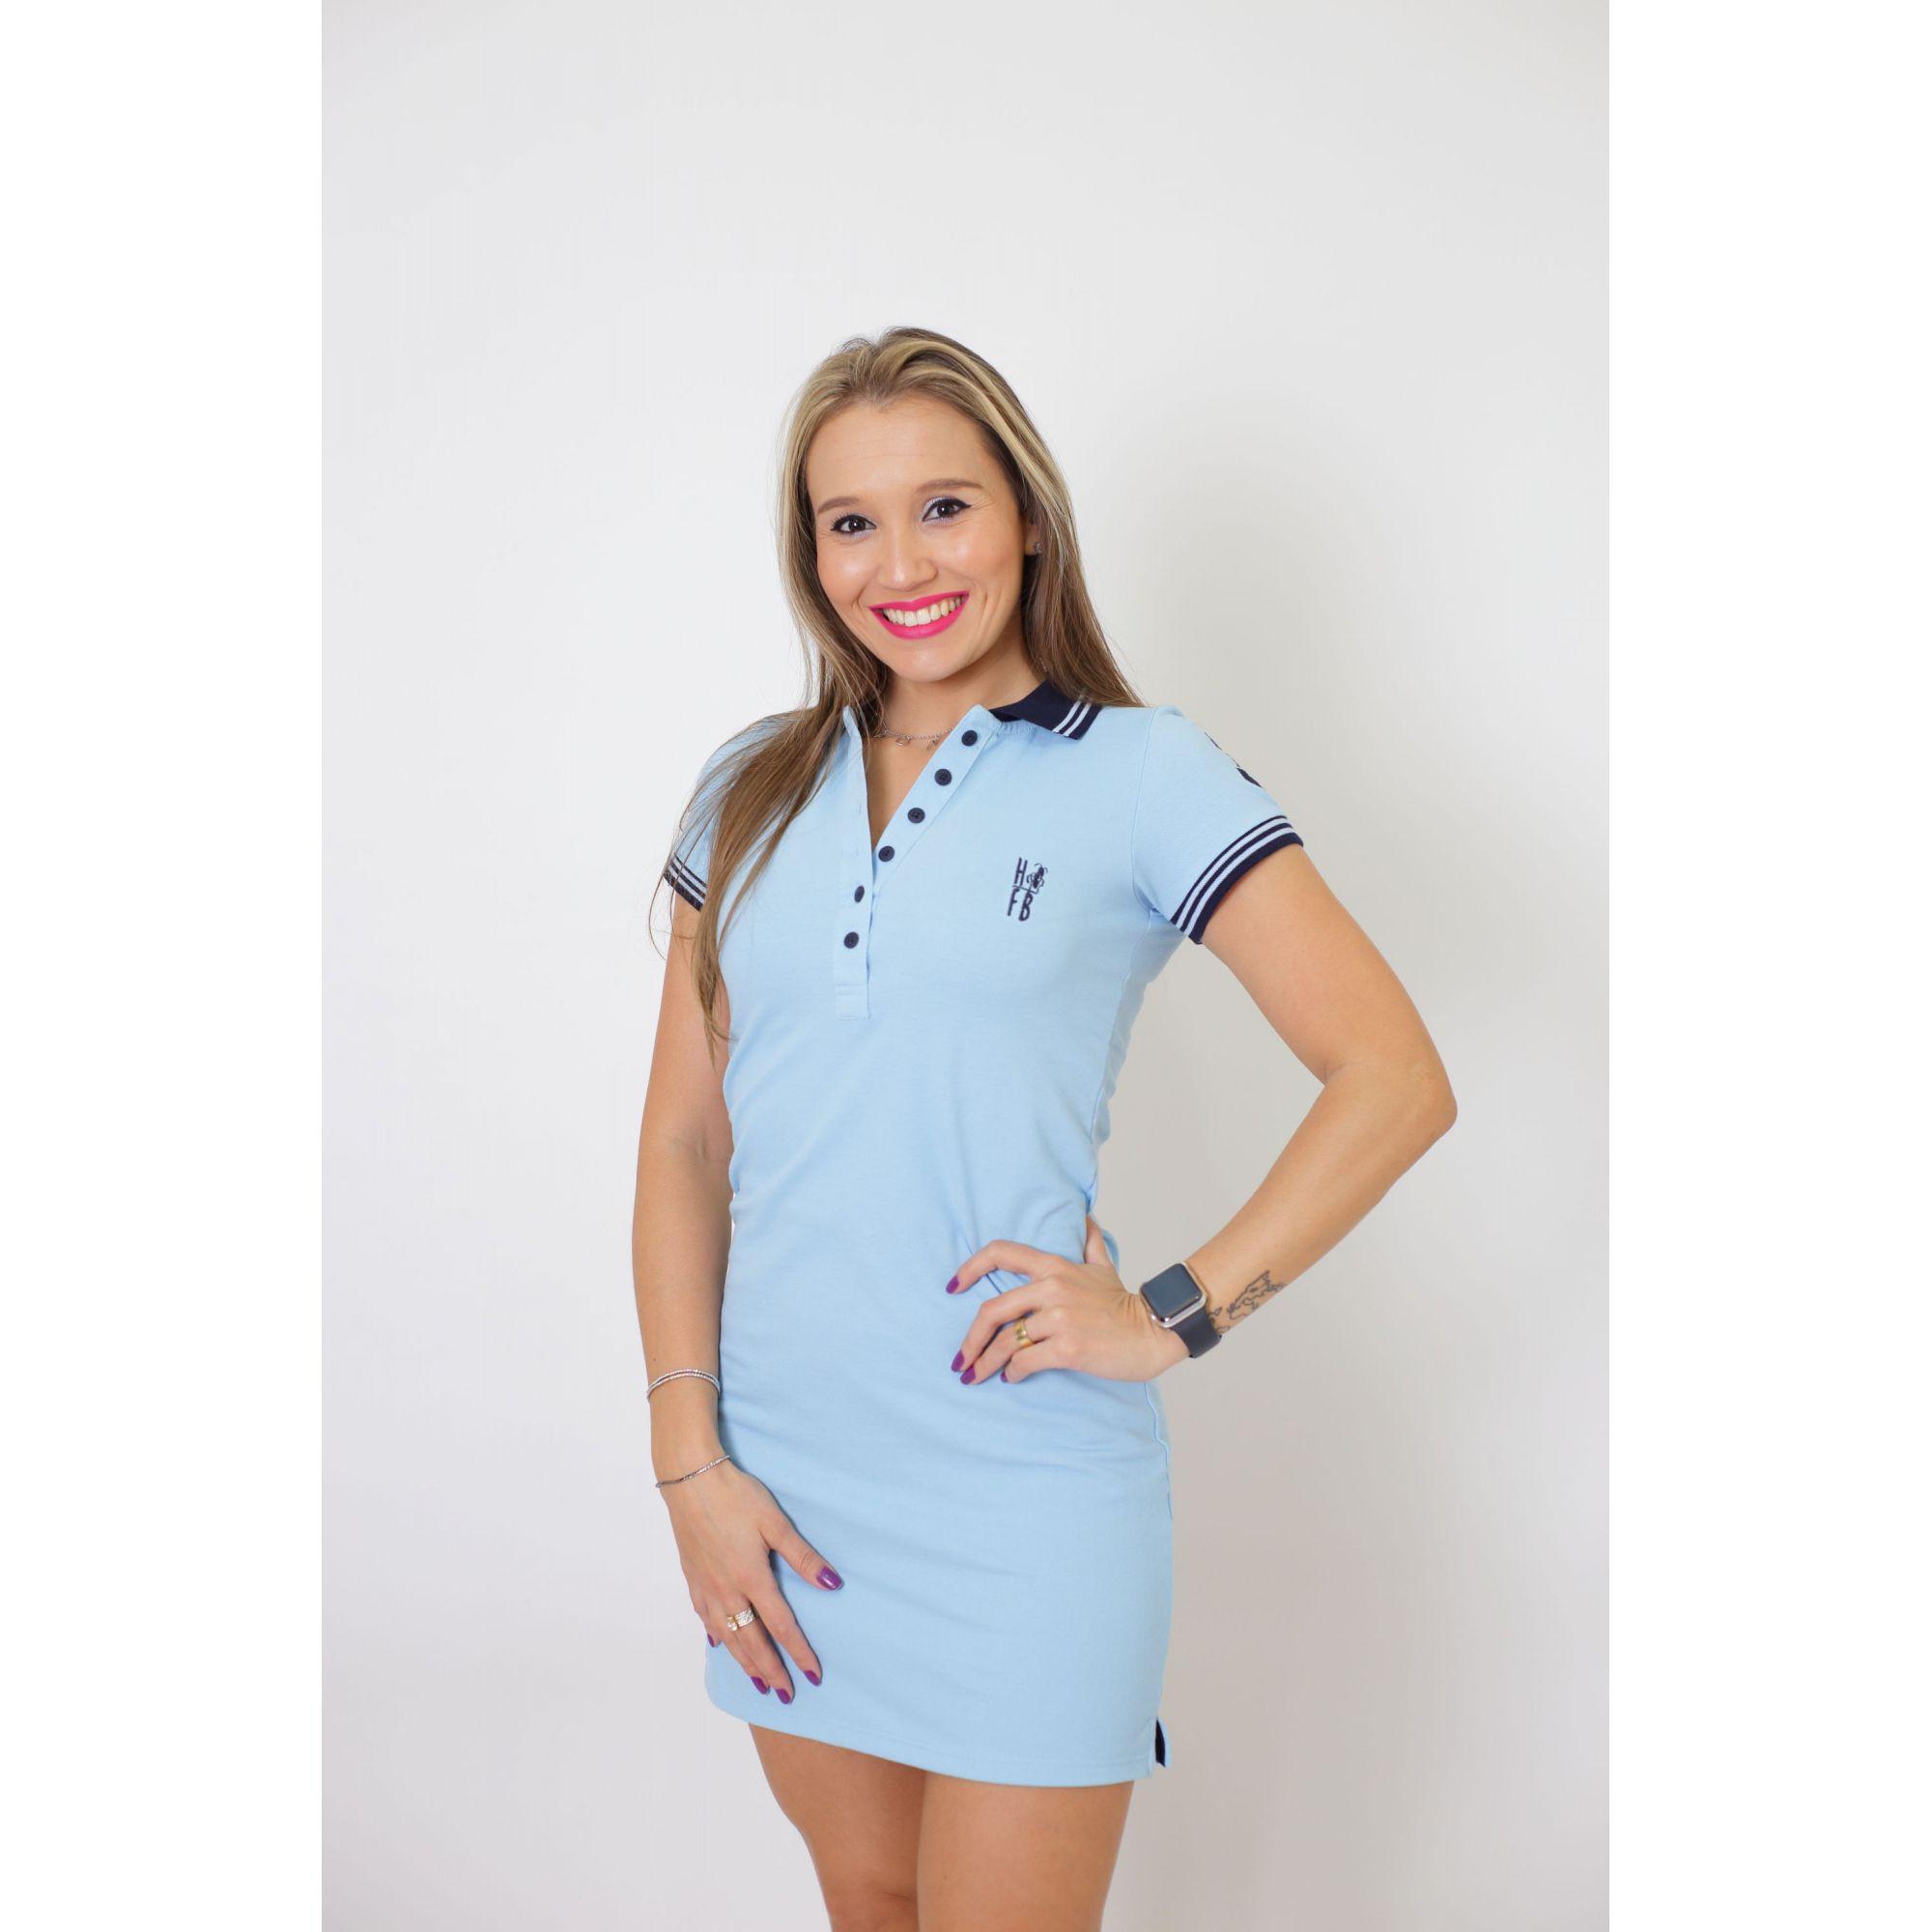 MÃE E FILHO > Kit 02 peças Vestido + Body  Unissex Polo - Azul Nobreza [Coleção Tal Mãe Tal Filho]  - Heitor Fashion Brazil